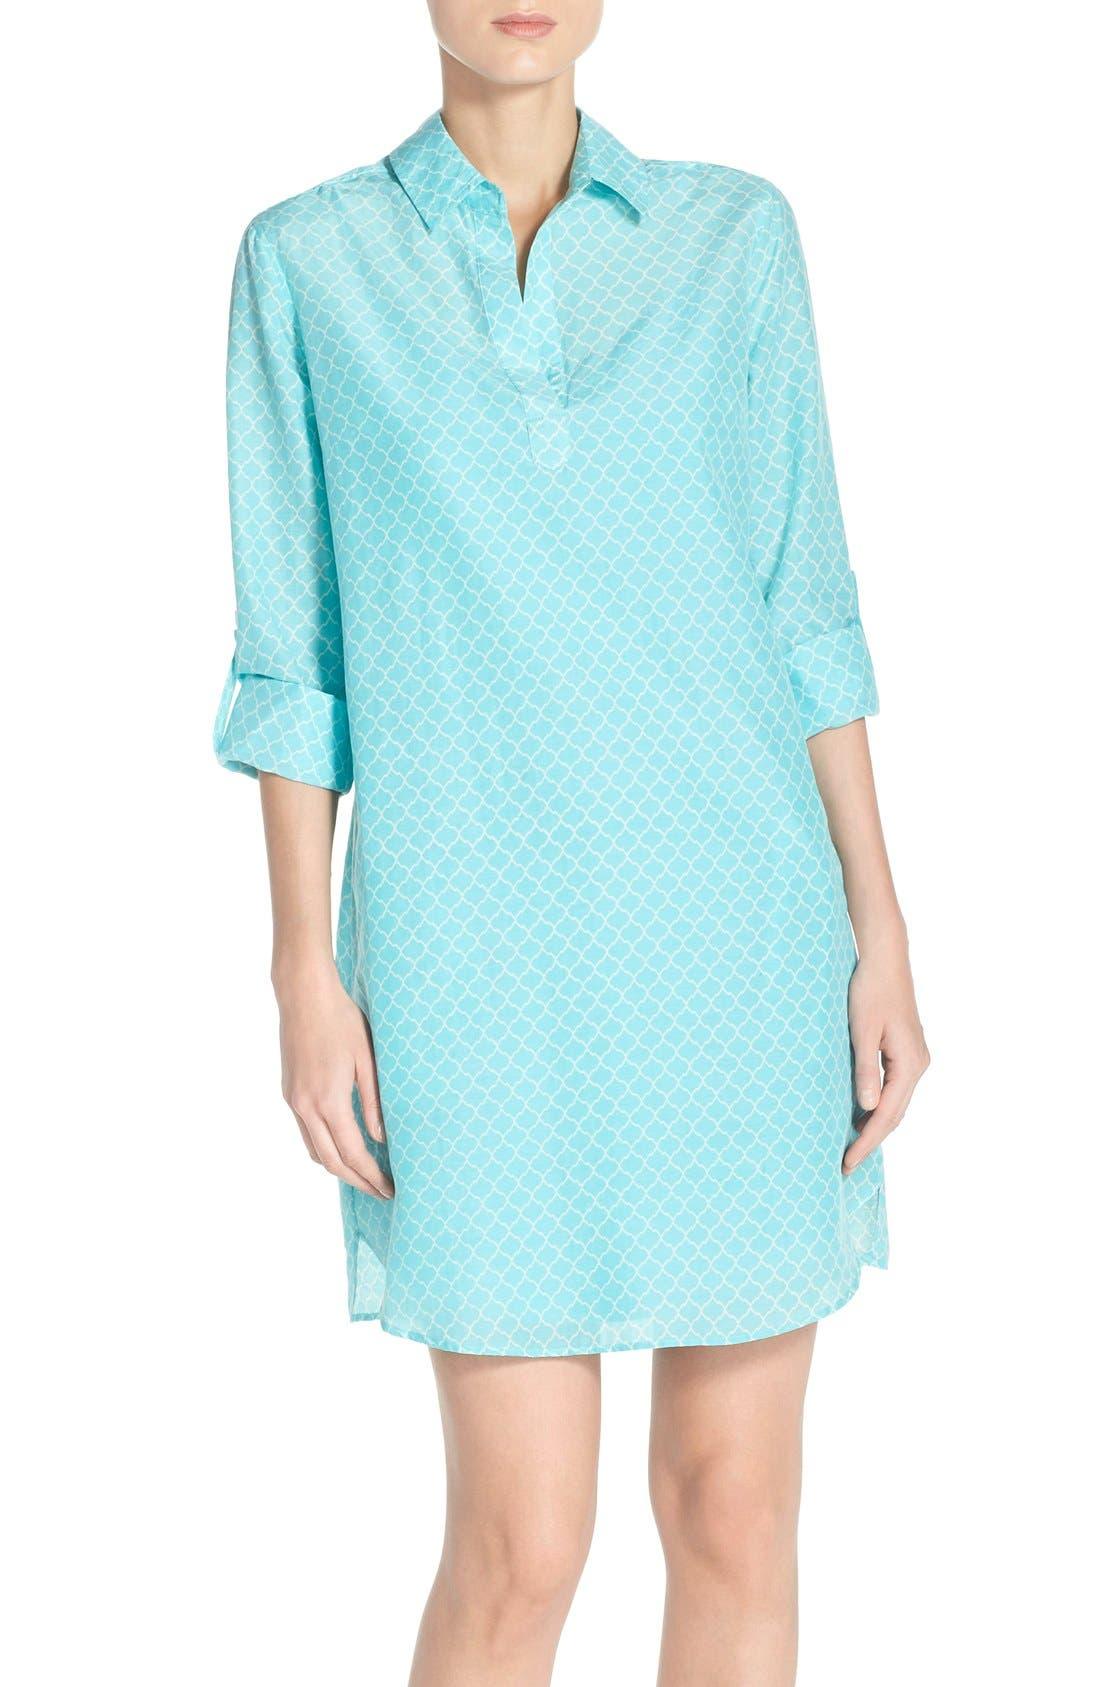 Alternate Image 1 Selected - KUT from the Kloth Print Chambray Shirtdress